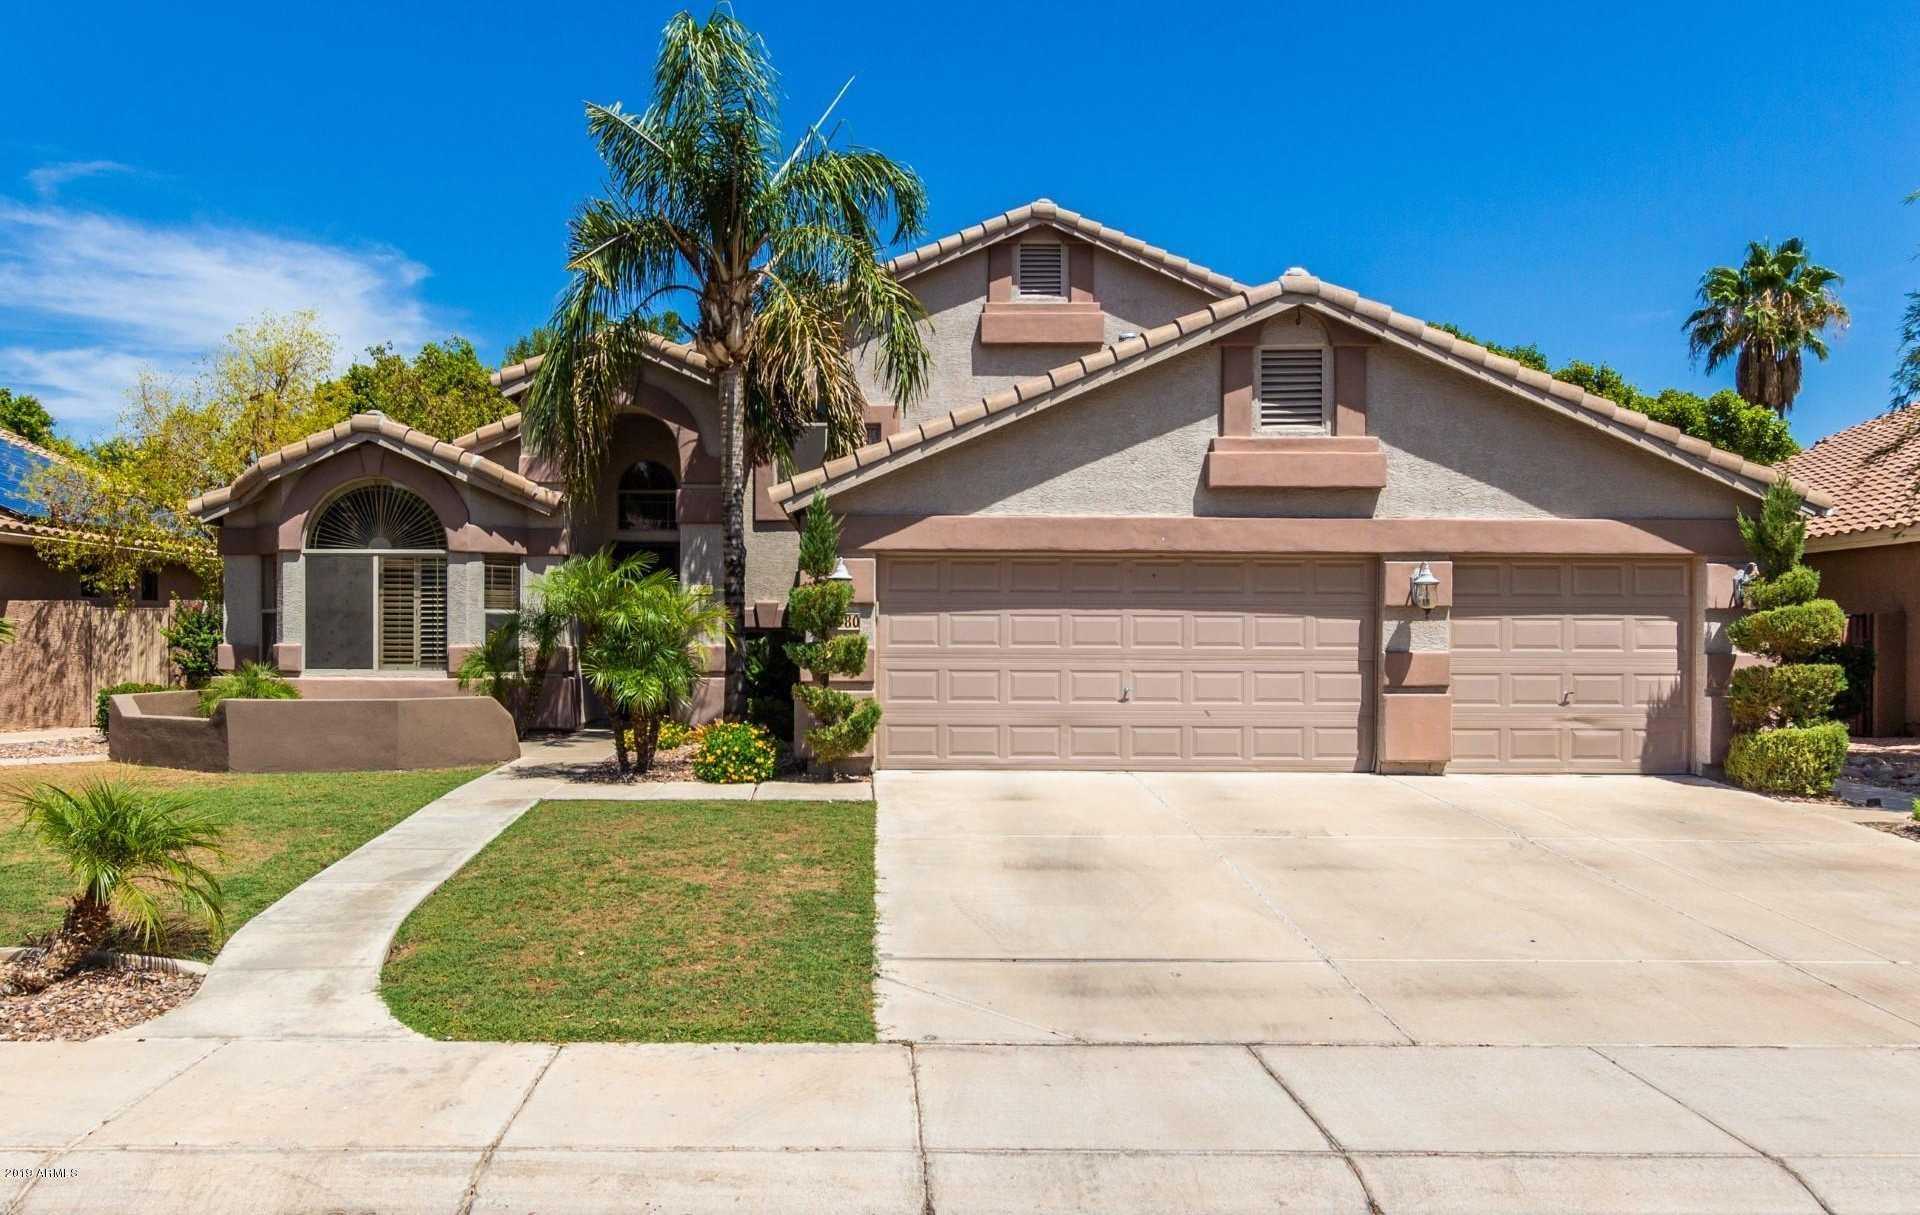 $510,000 - 5Br/3Ba - Home for Sale in Diamante Vista, Glendale